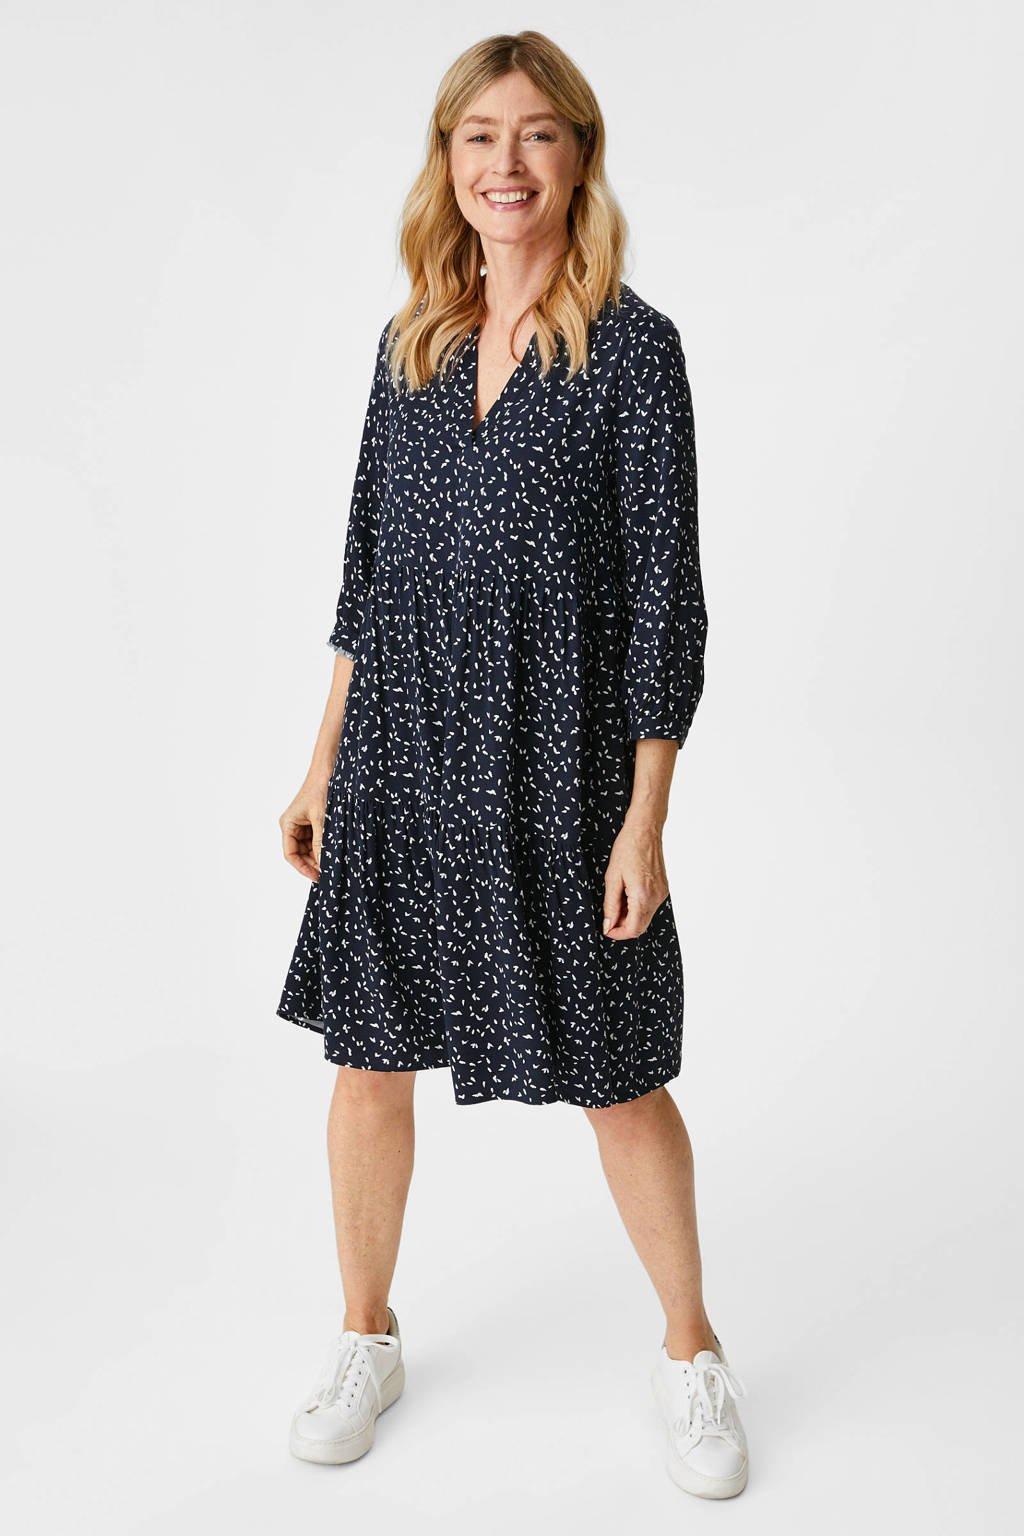 C&A Canda Premium jurk met all over print en ruches blauw, Blauw